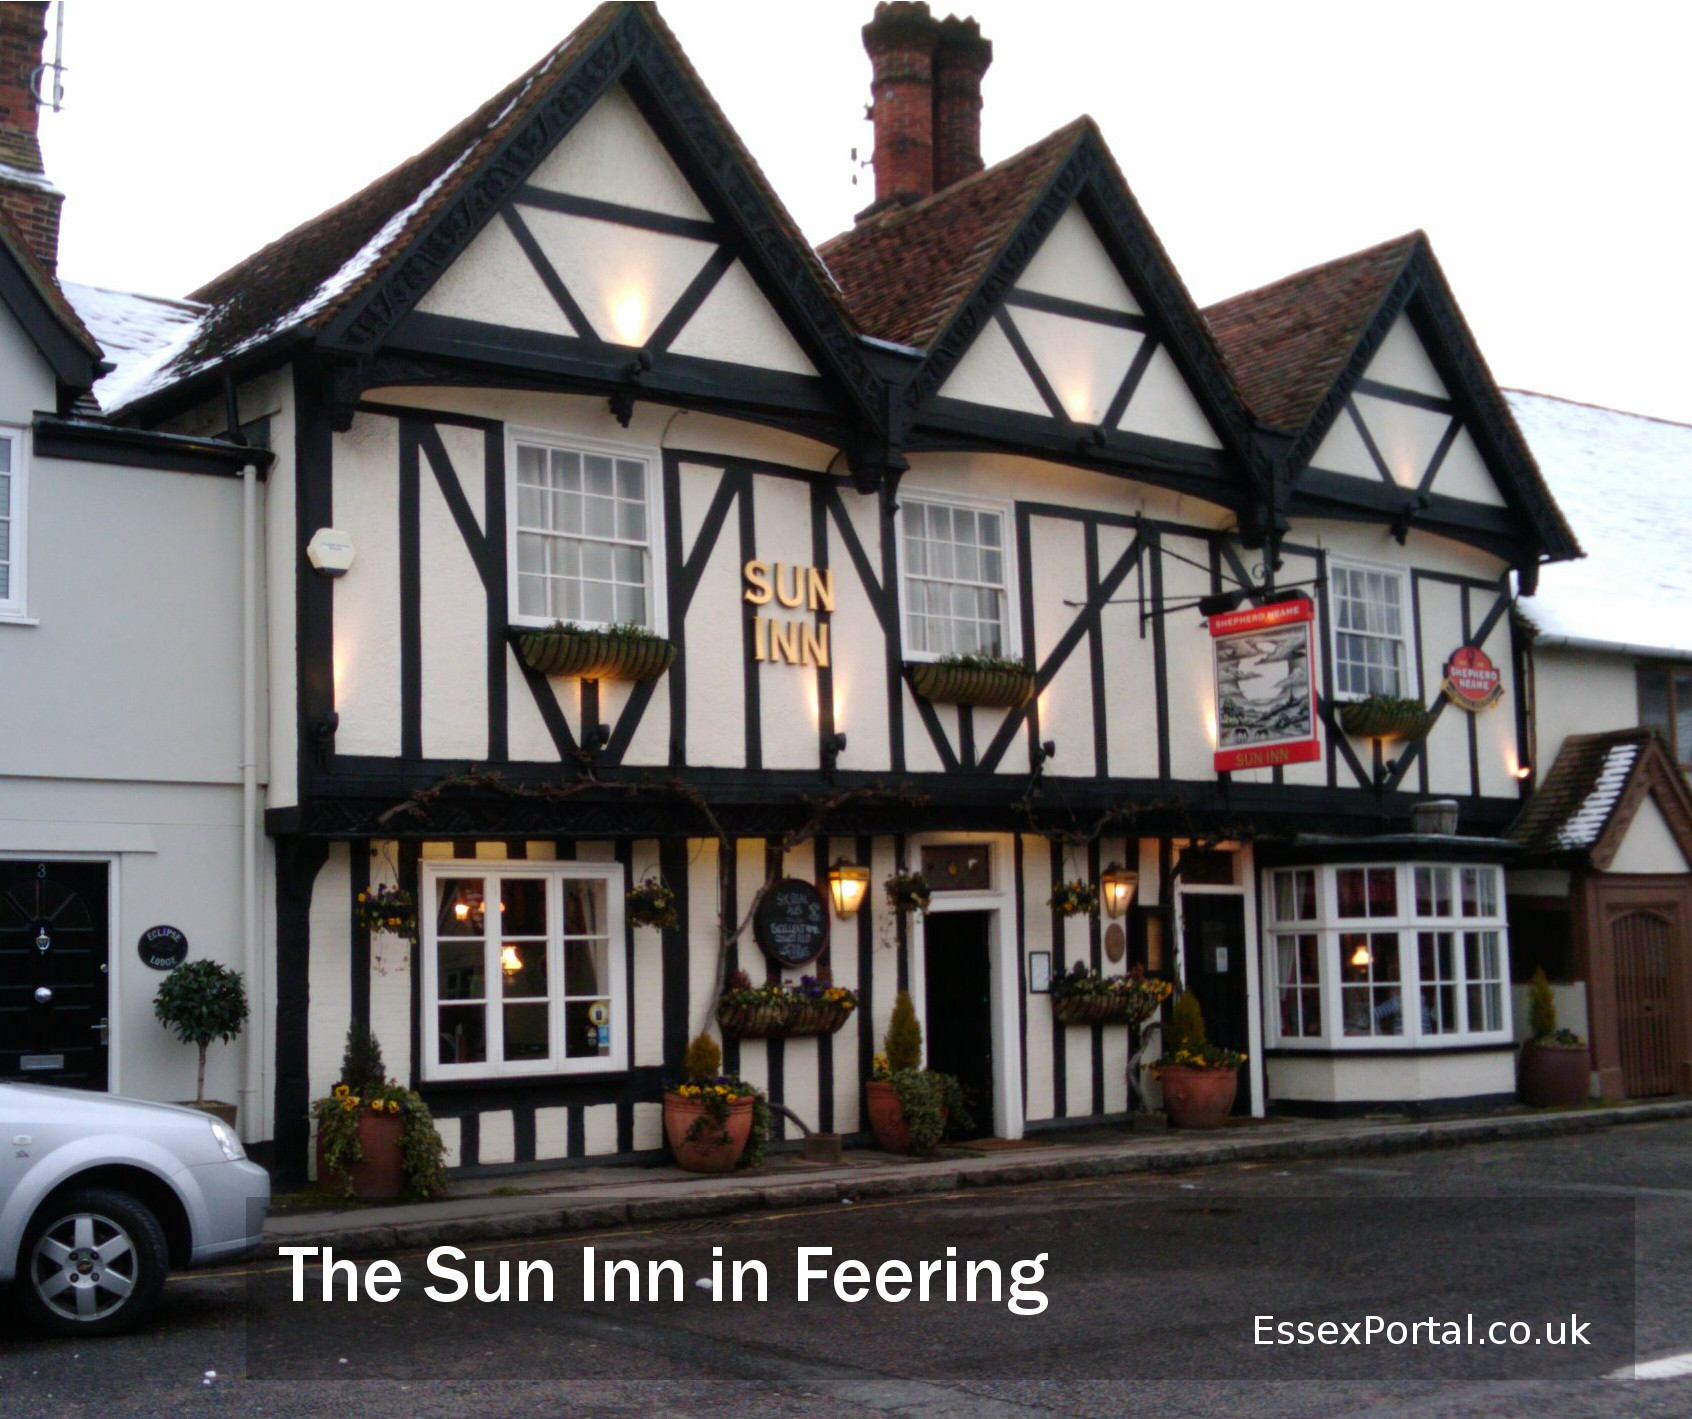 The Sun Inn in Feering